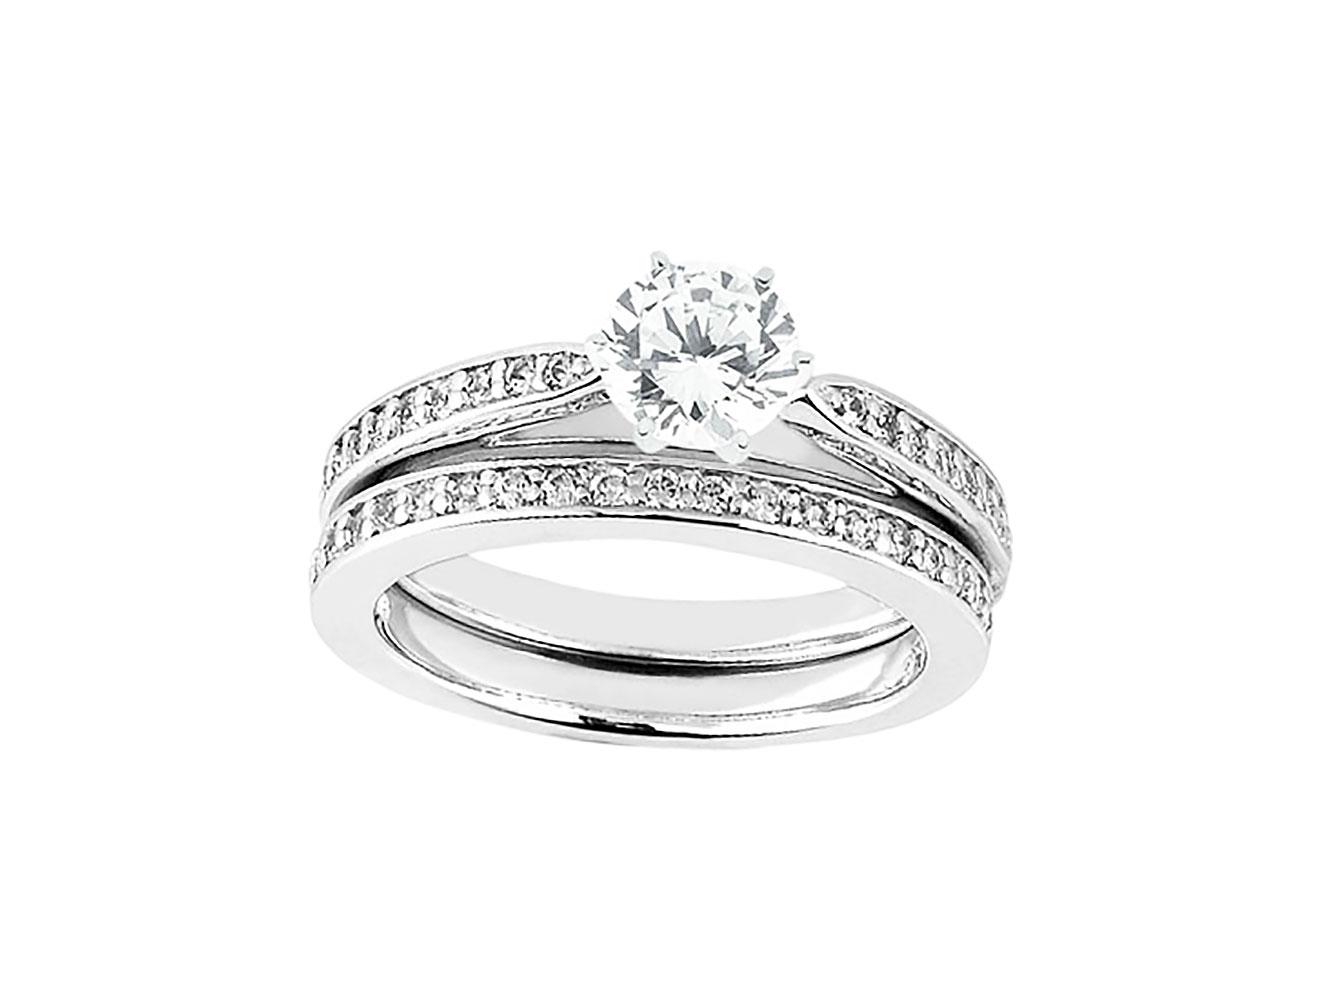 moda mejor valorada imágenes detalladas diseño encantador Detalles de Original 0,60 Ct Anillo de Compromiso Diamante Corte Princesa  Set Sólido